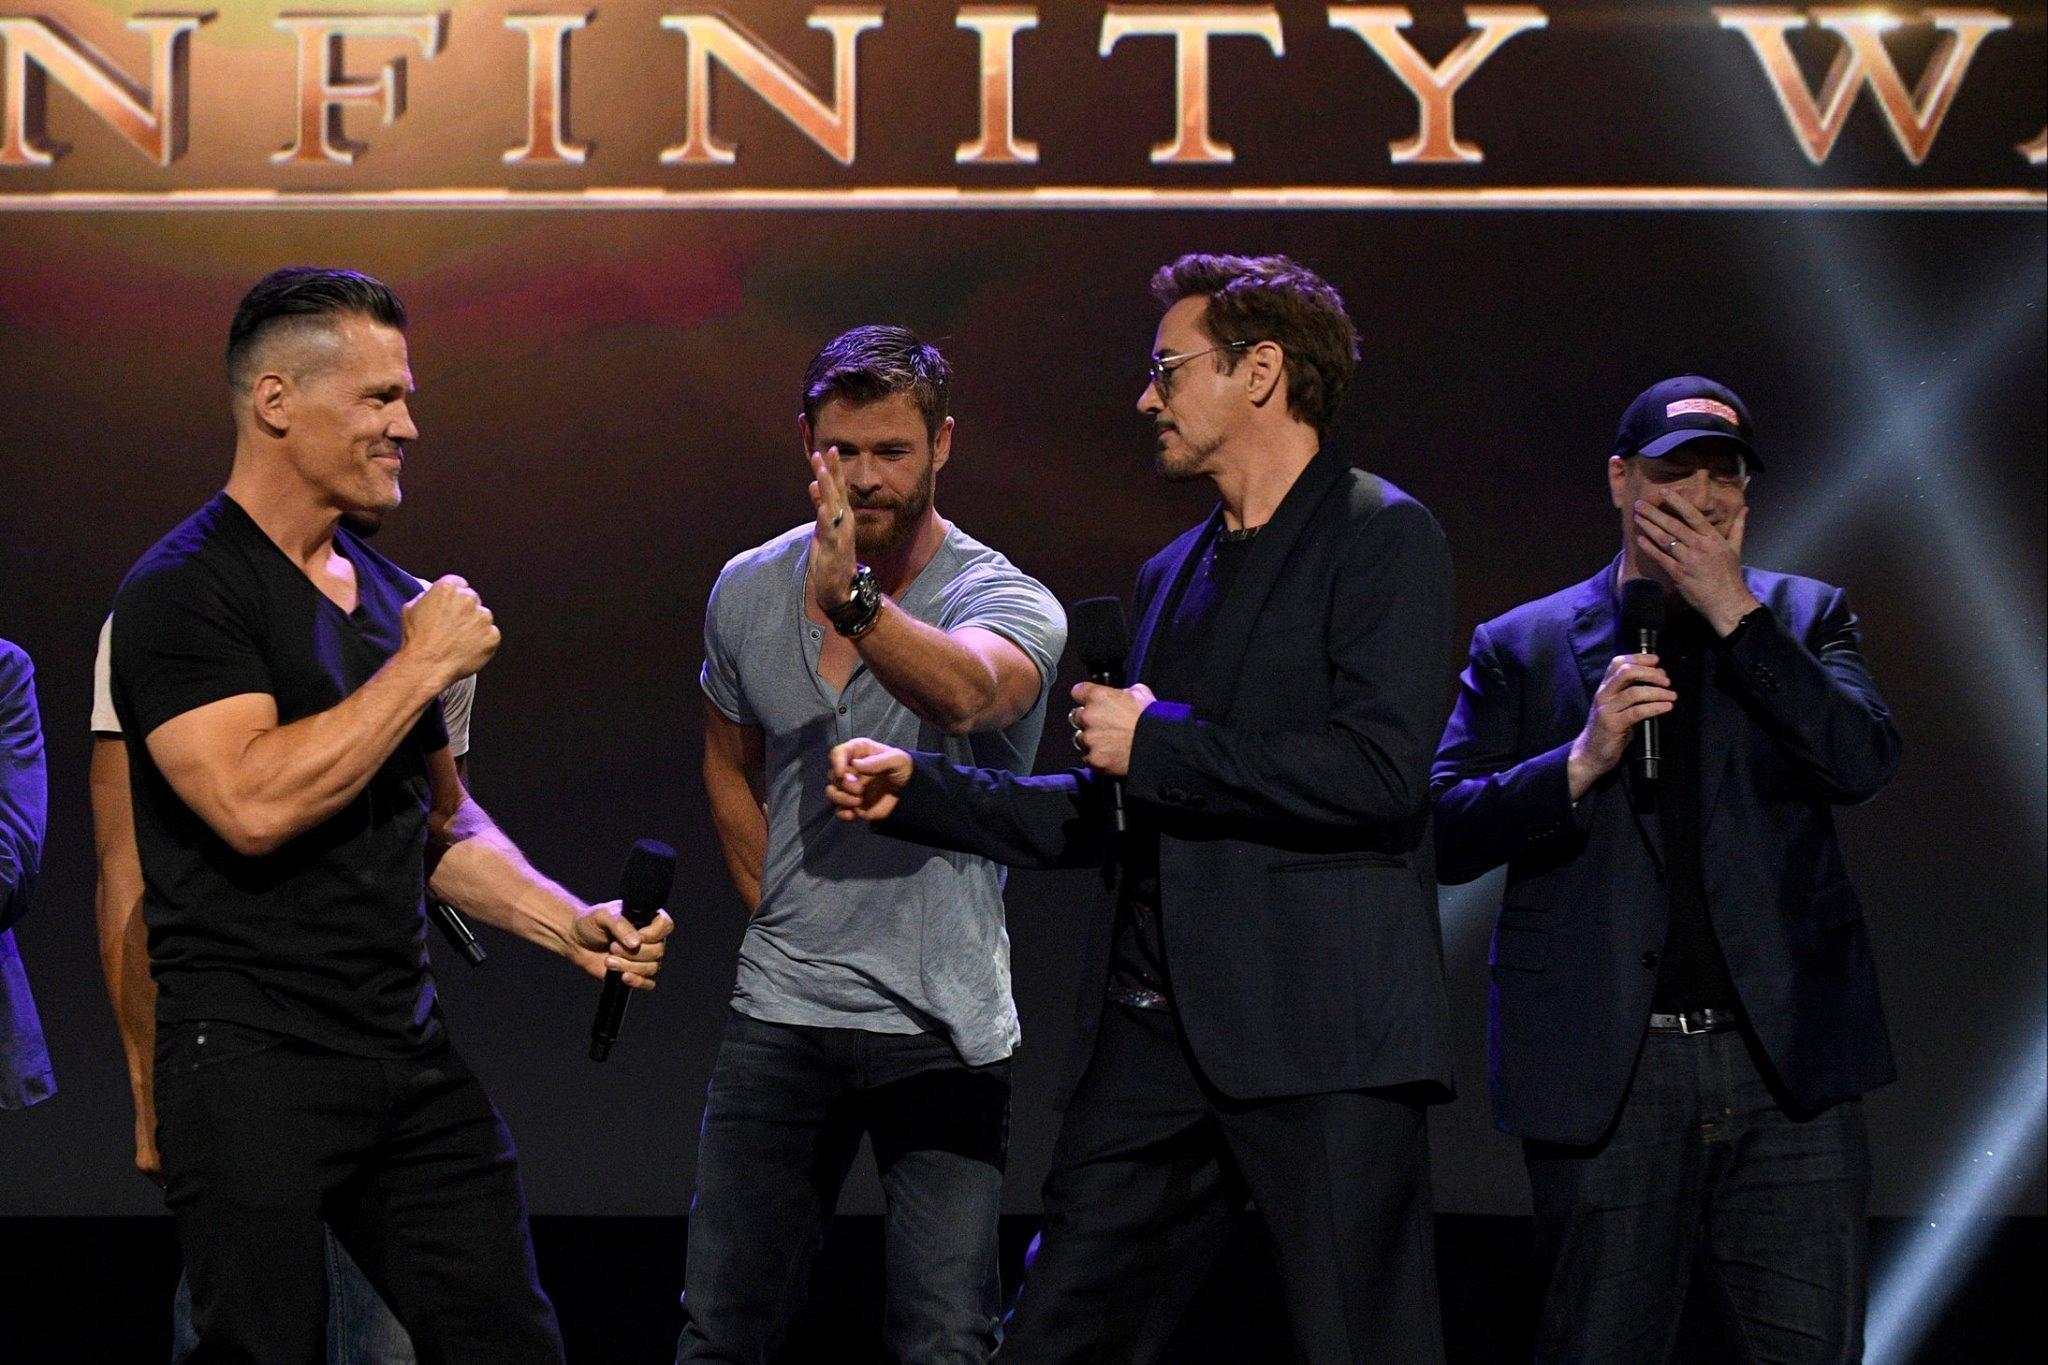 Photo du film Avengers: Infinity War au D23 2017 avec Thanos versus Iron Man